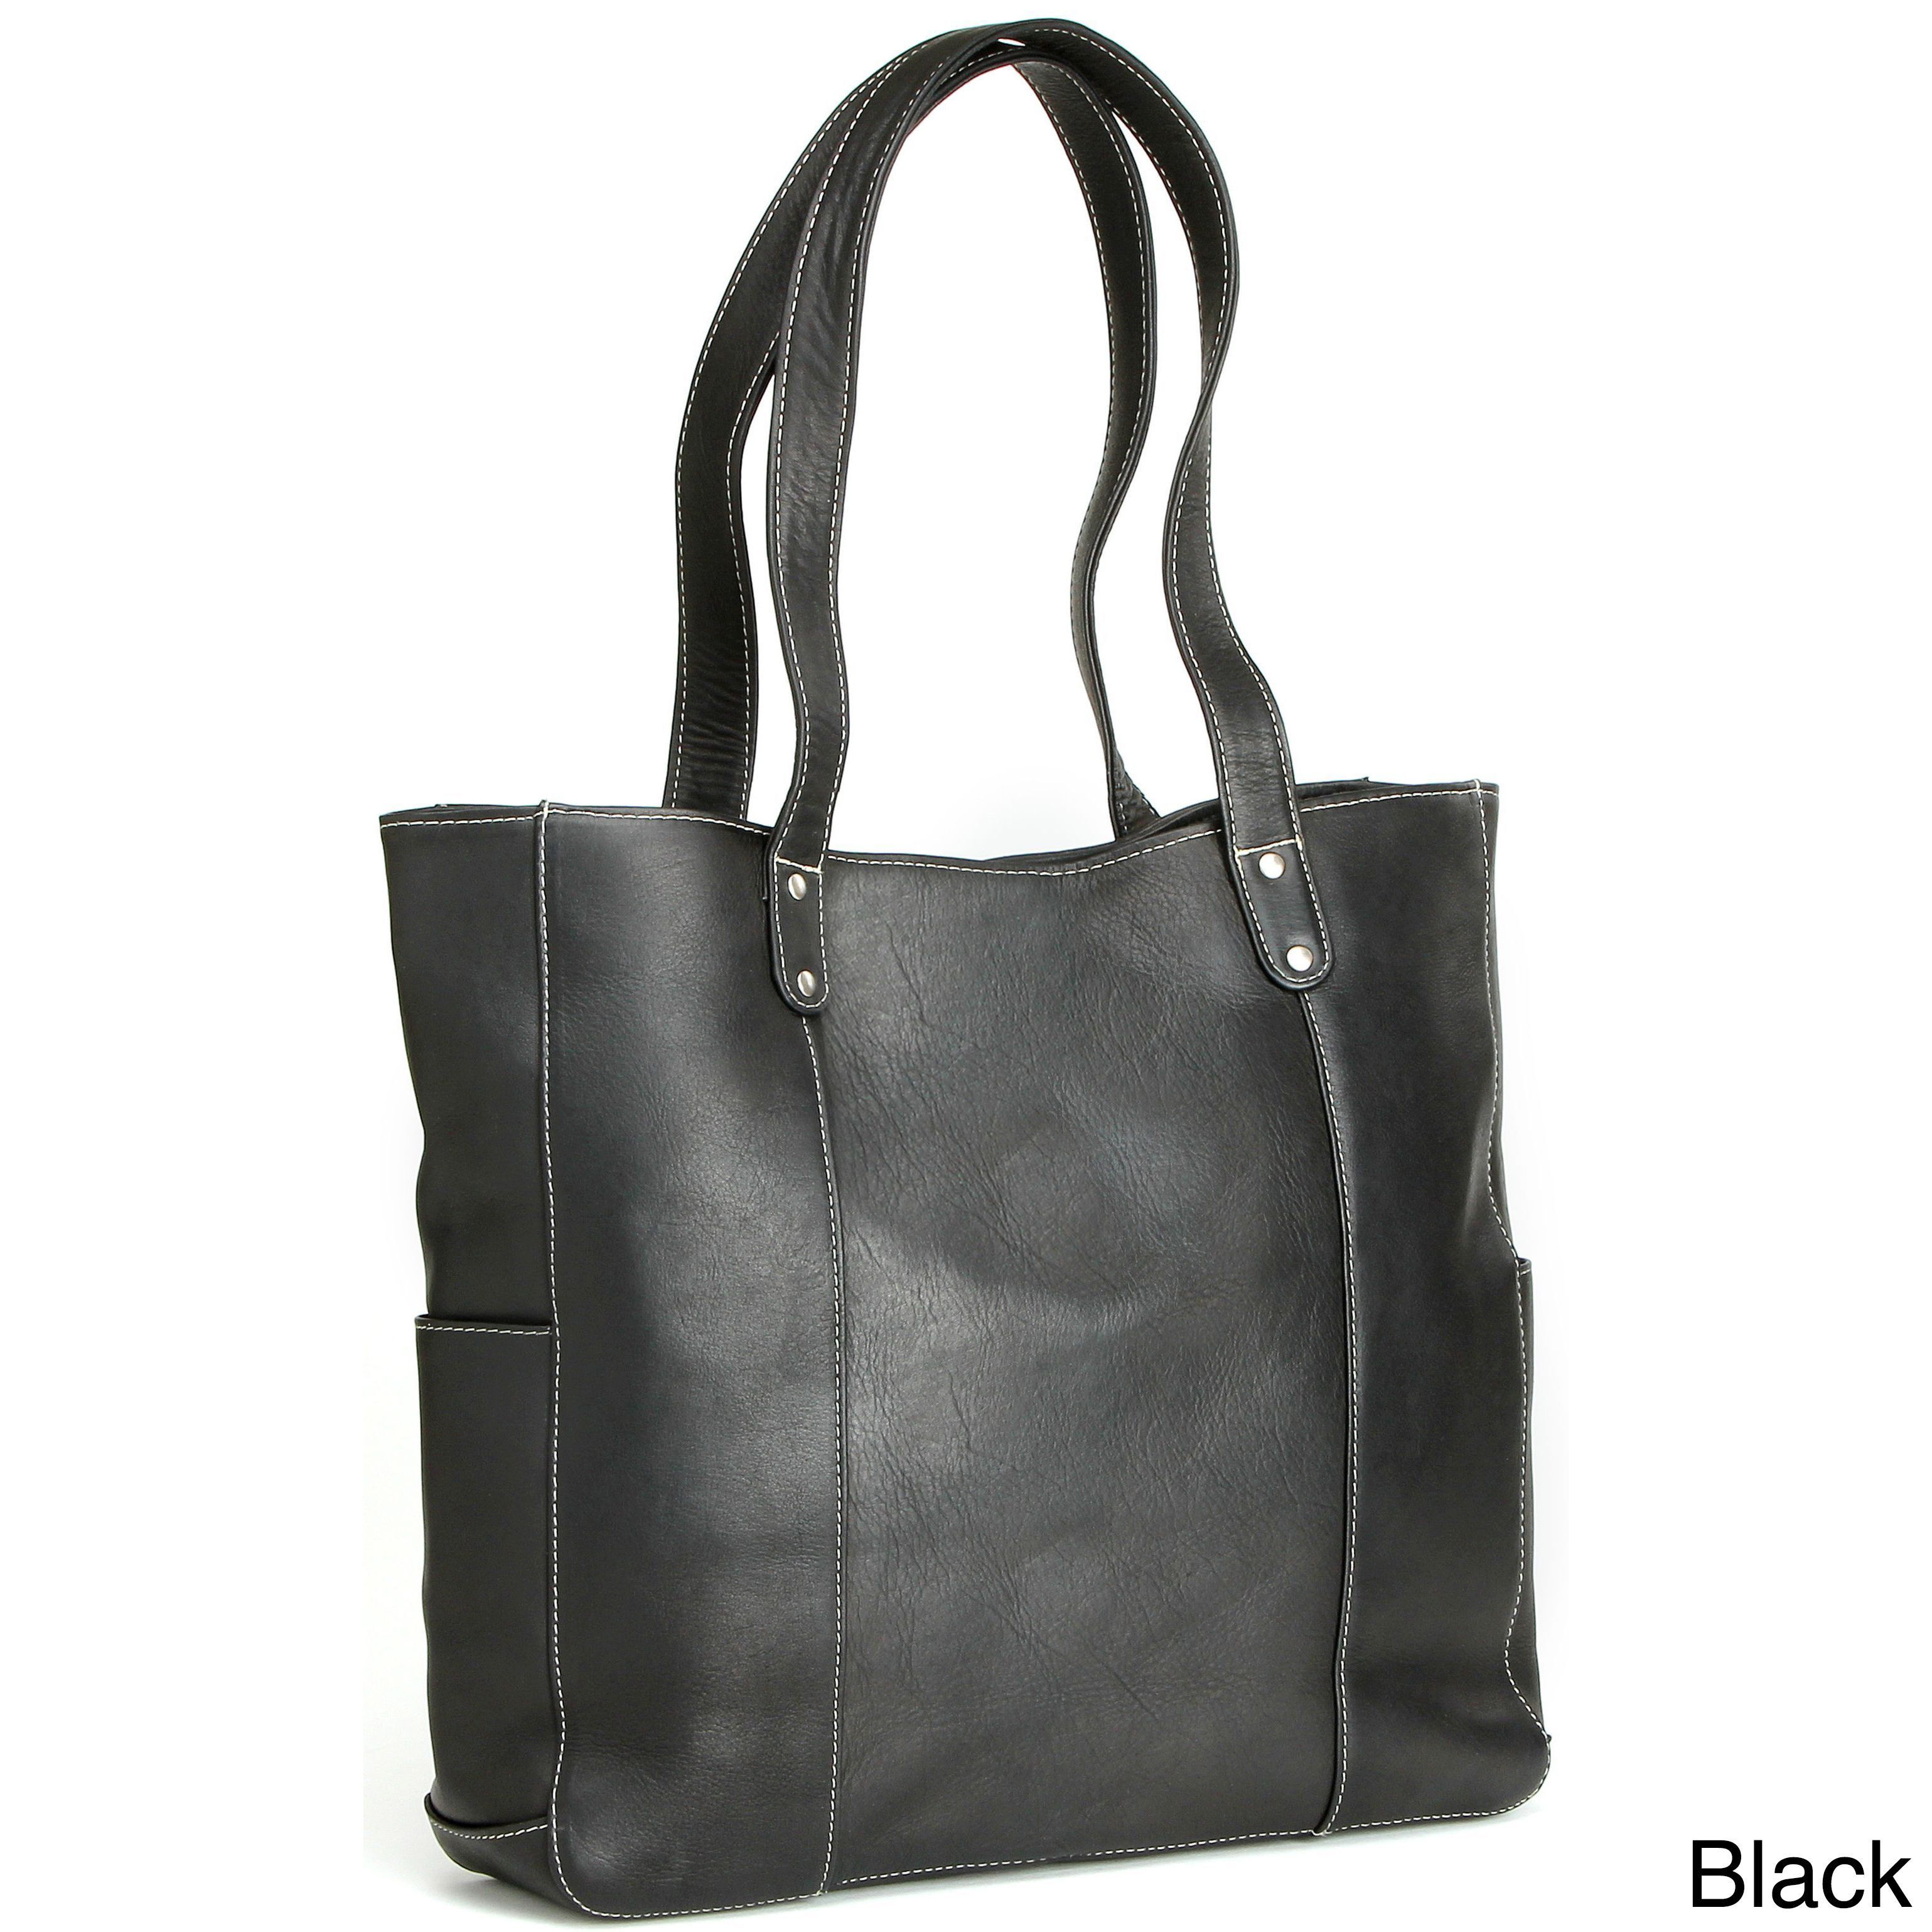 LeDonne Leather Double Strap Rivet Tote Bag (Black) 4dc8fde848226